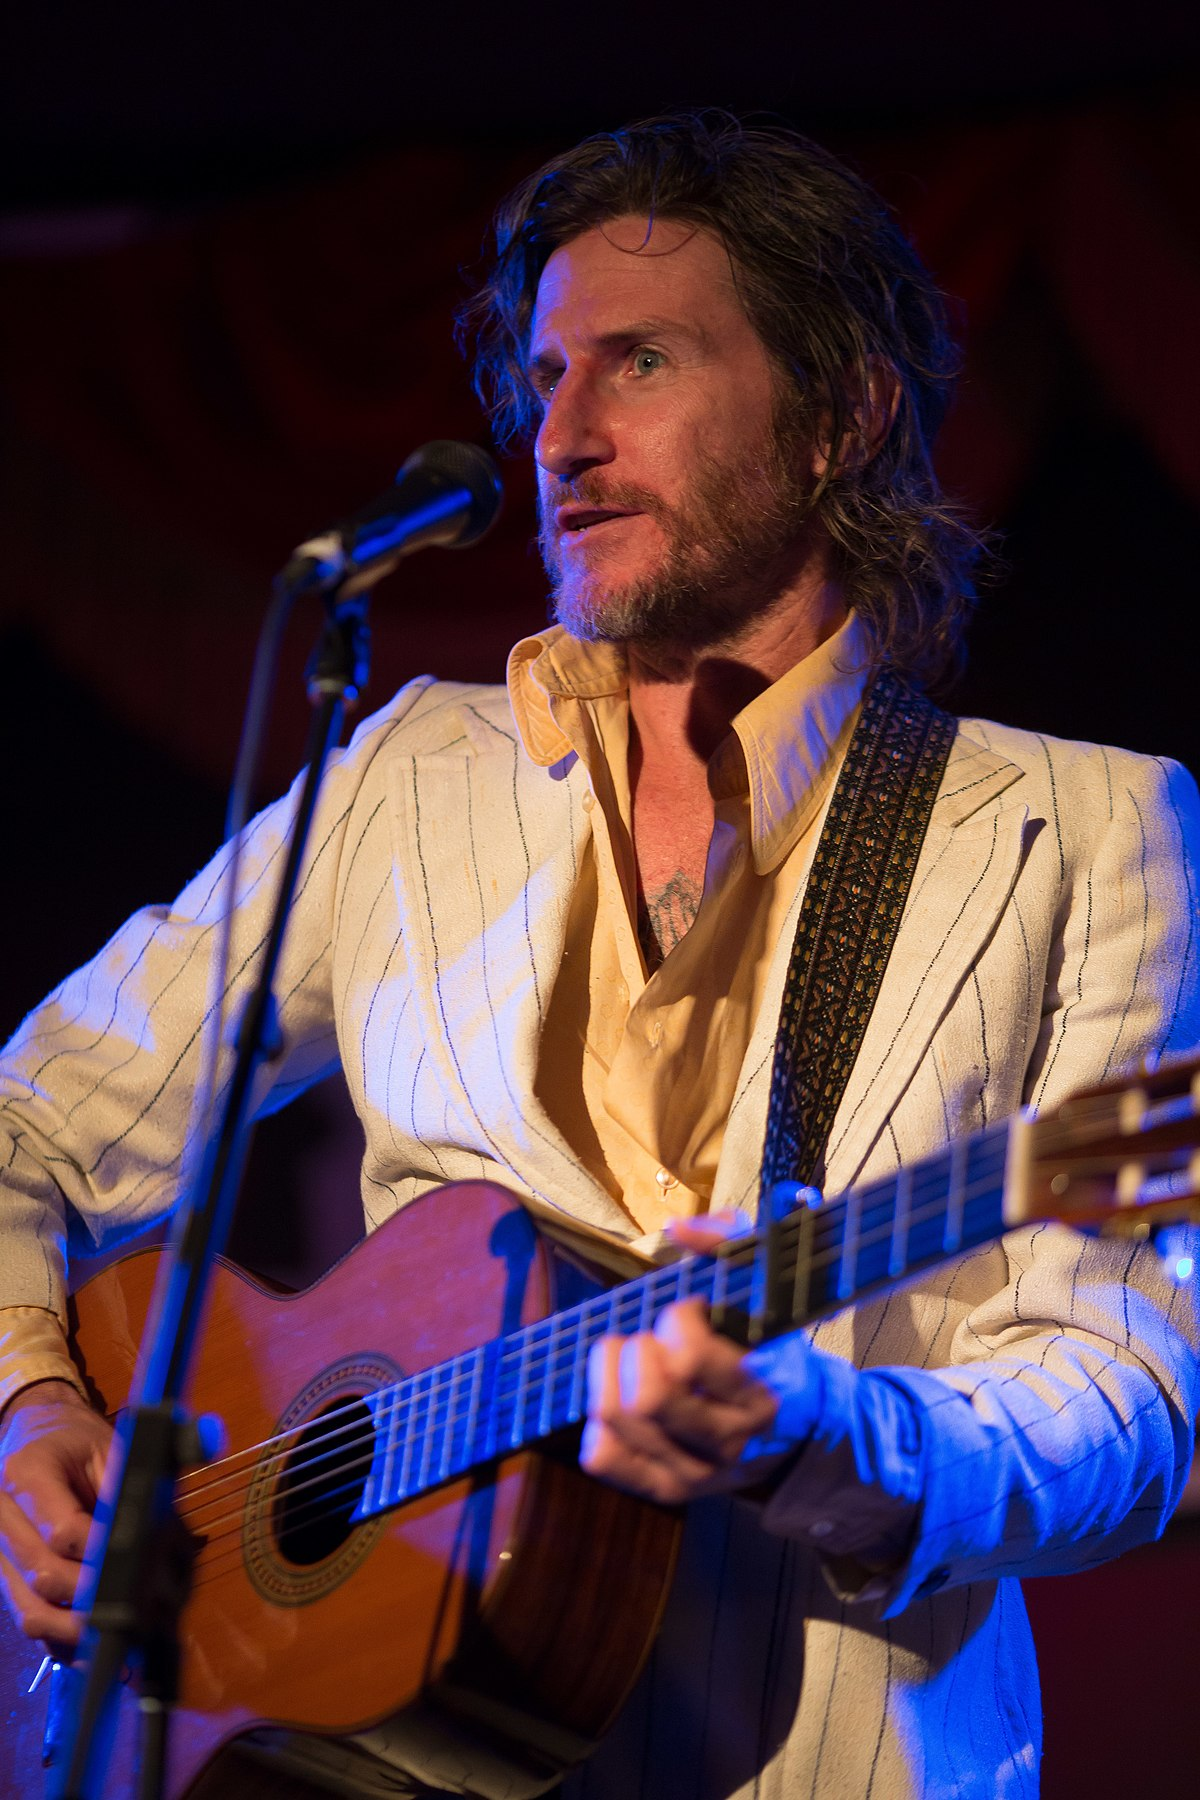 Tim Rogers Musician Wikipedia